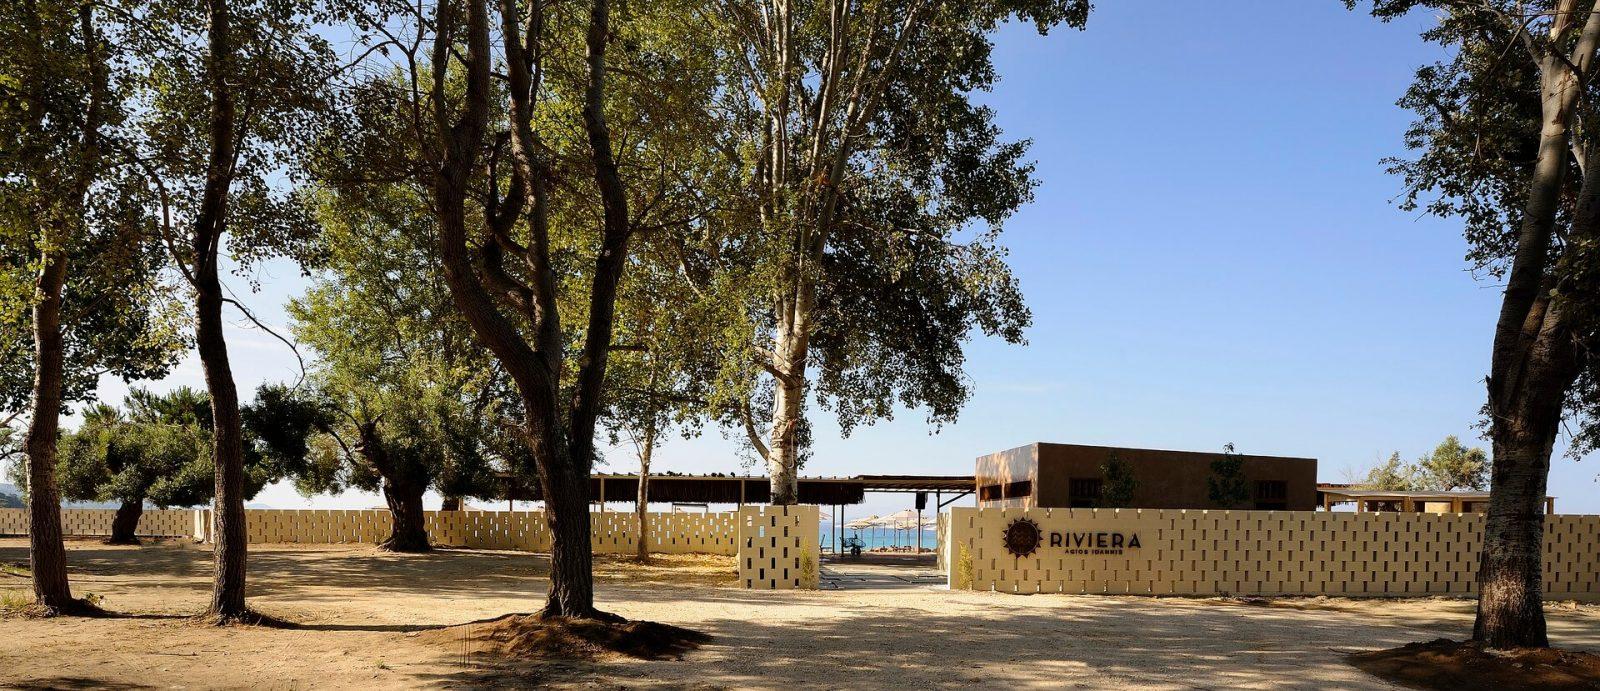 Riviera - 3